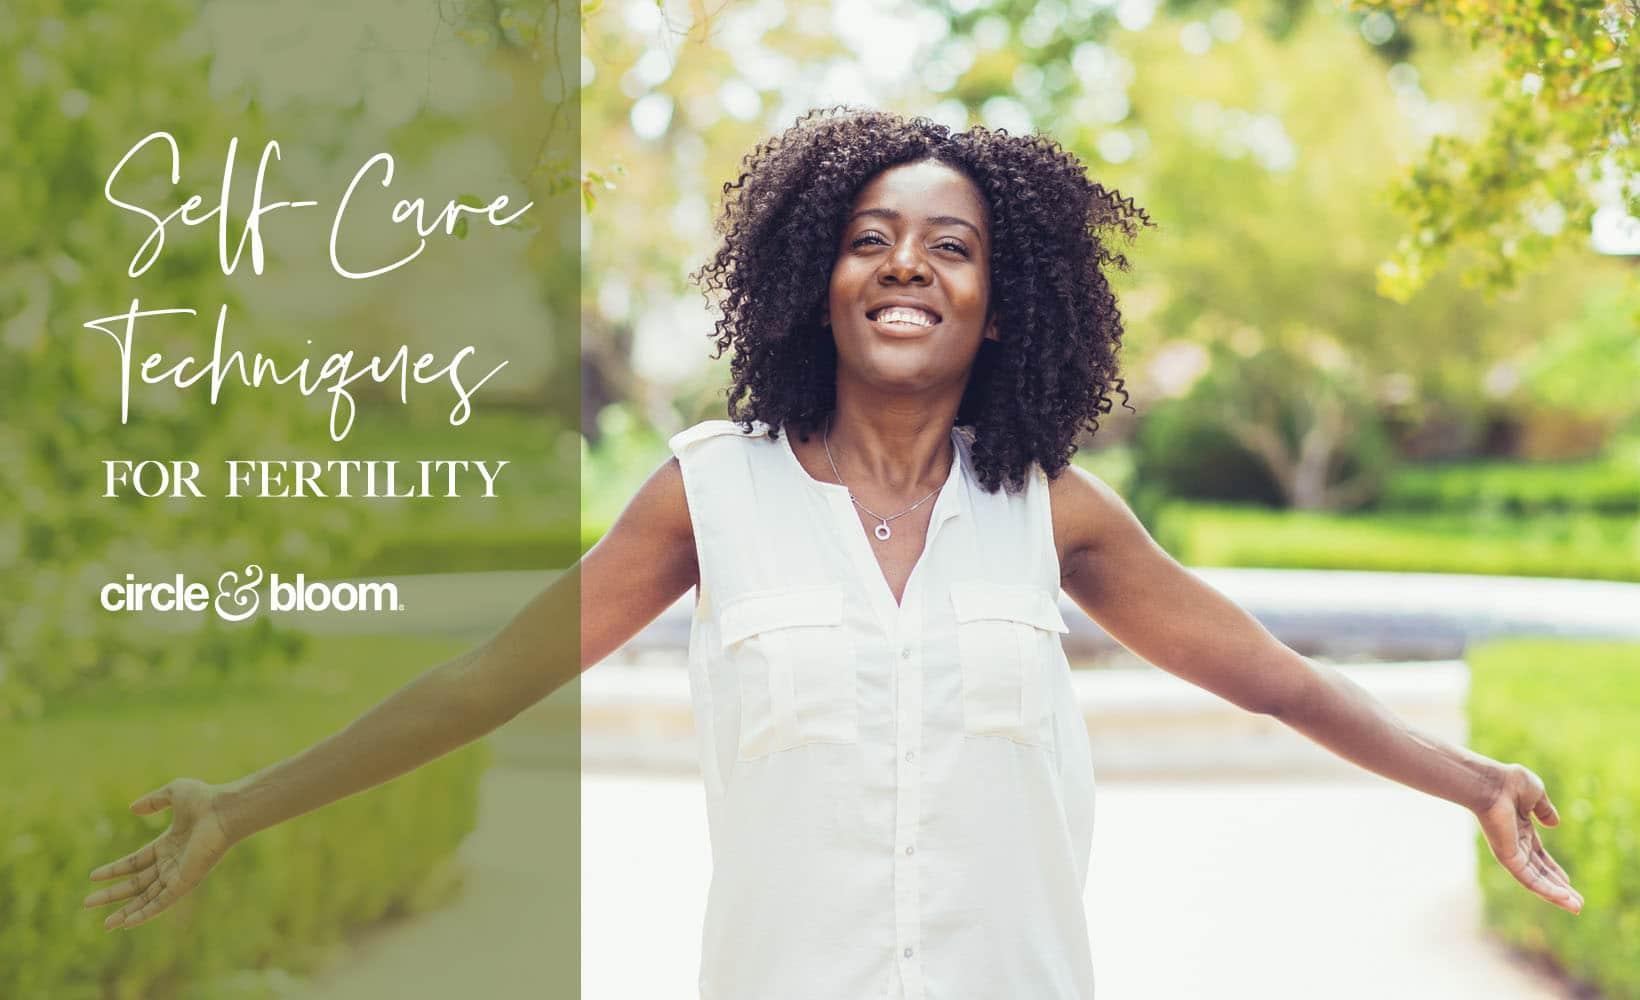 Self-Care Techniques for Fertility